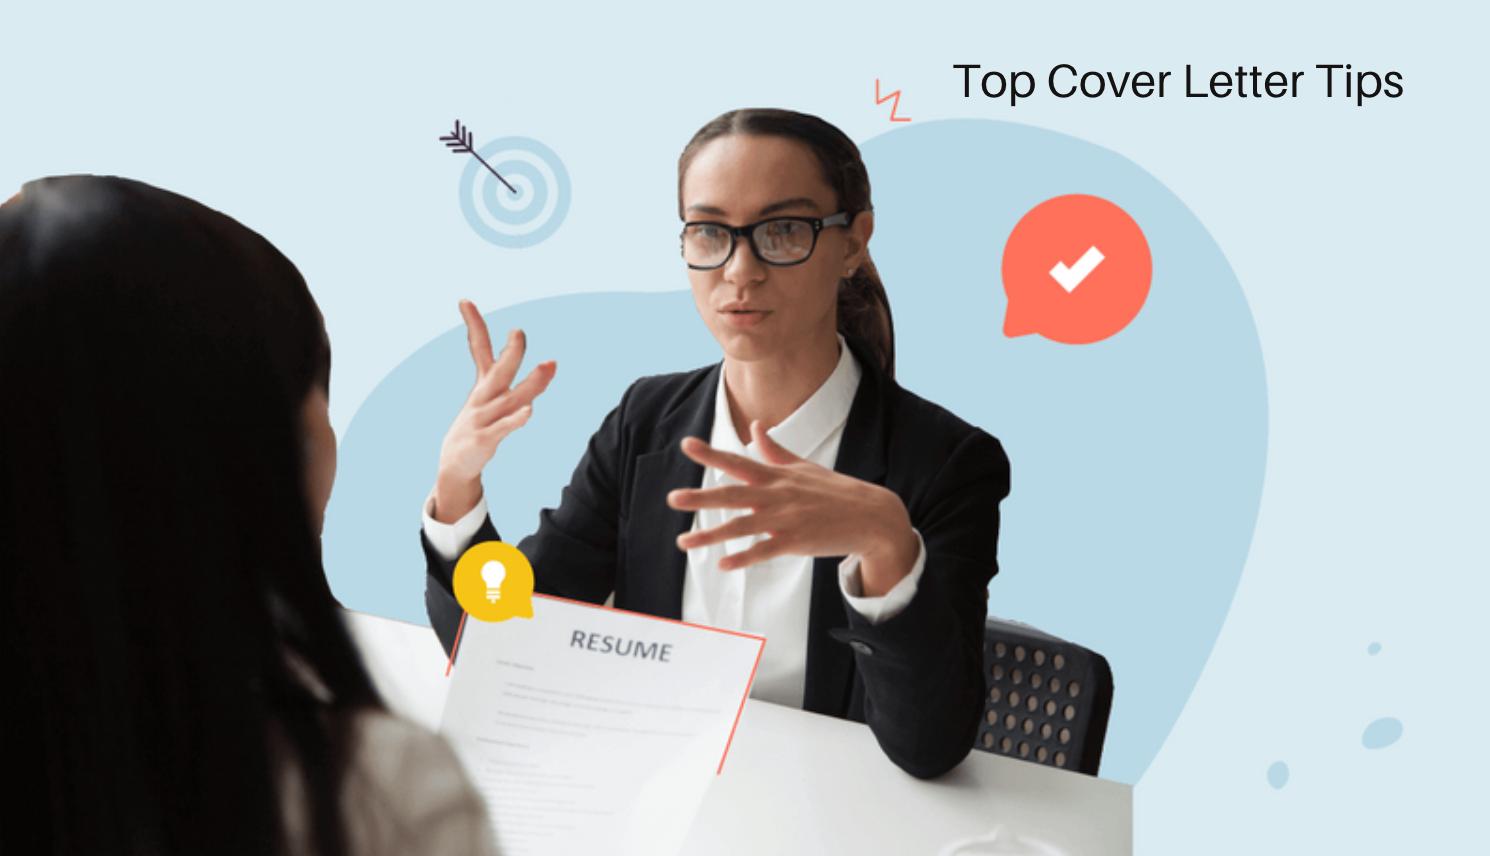 cover letter tips, cover letter writing tips